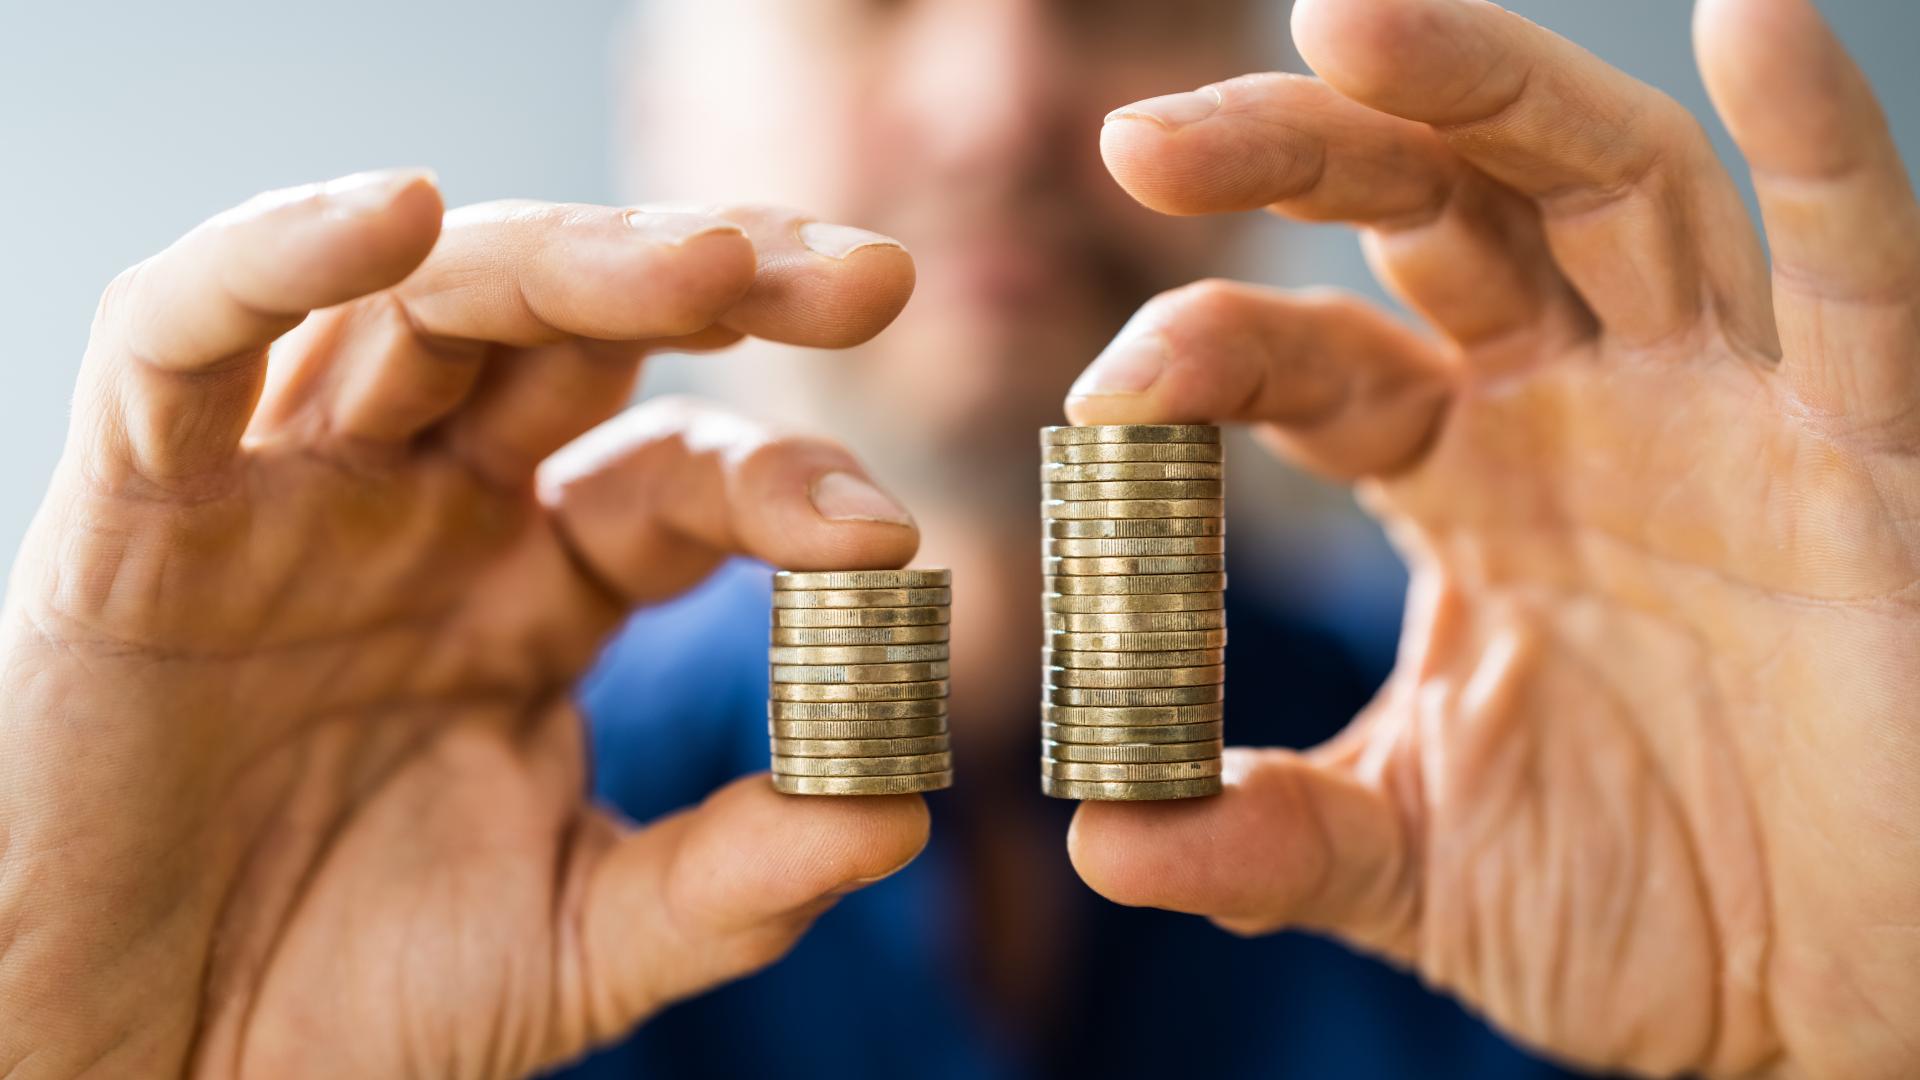 America's 1% widens tax gap to $600 billion